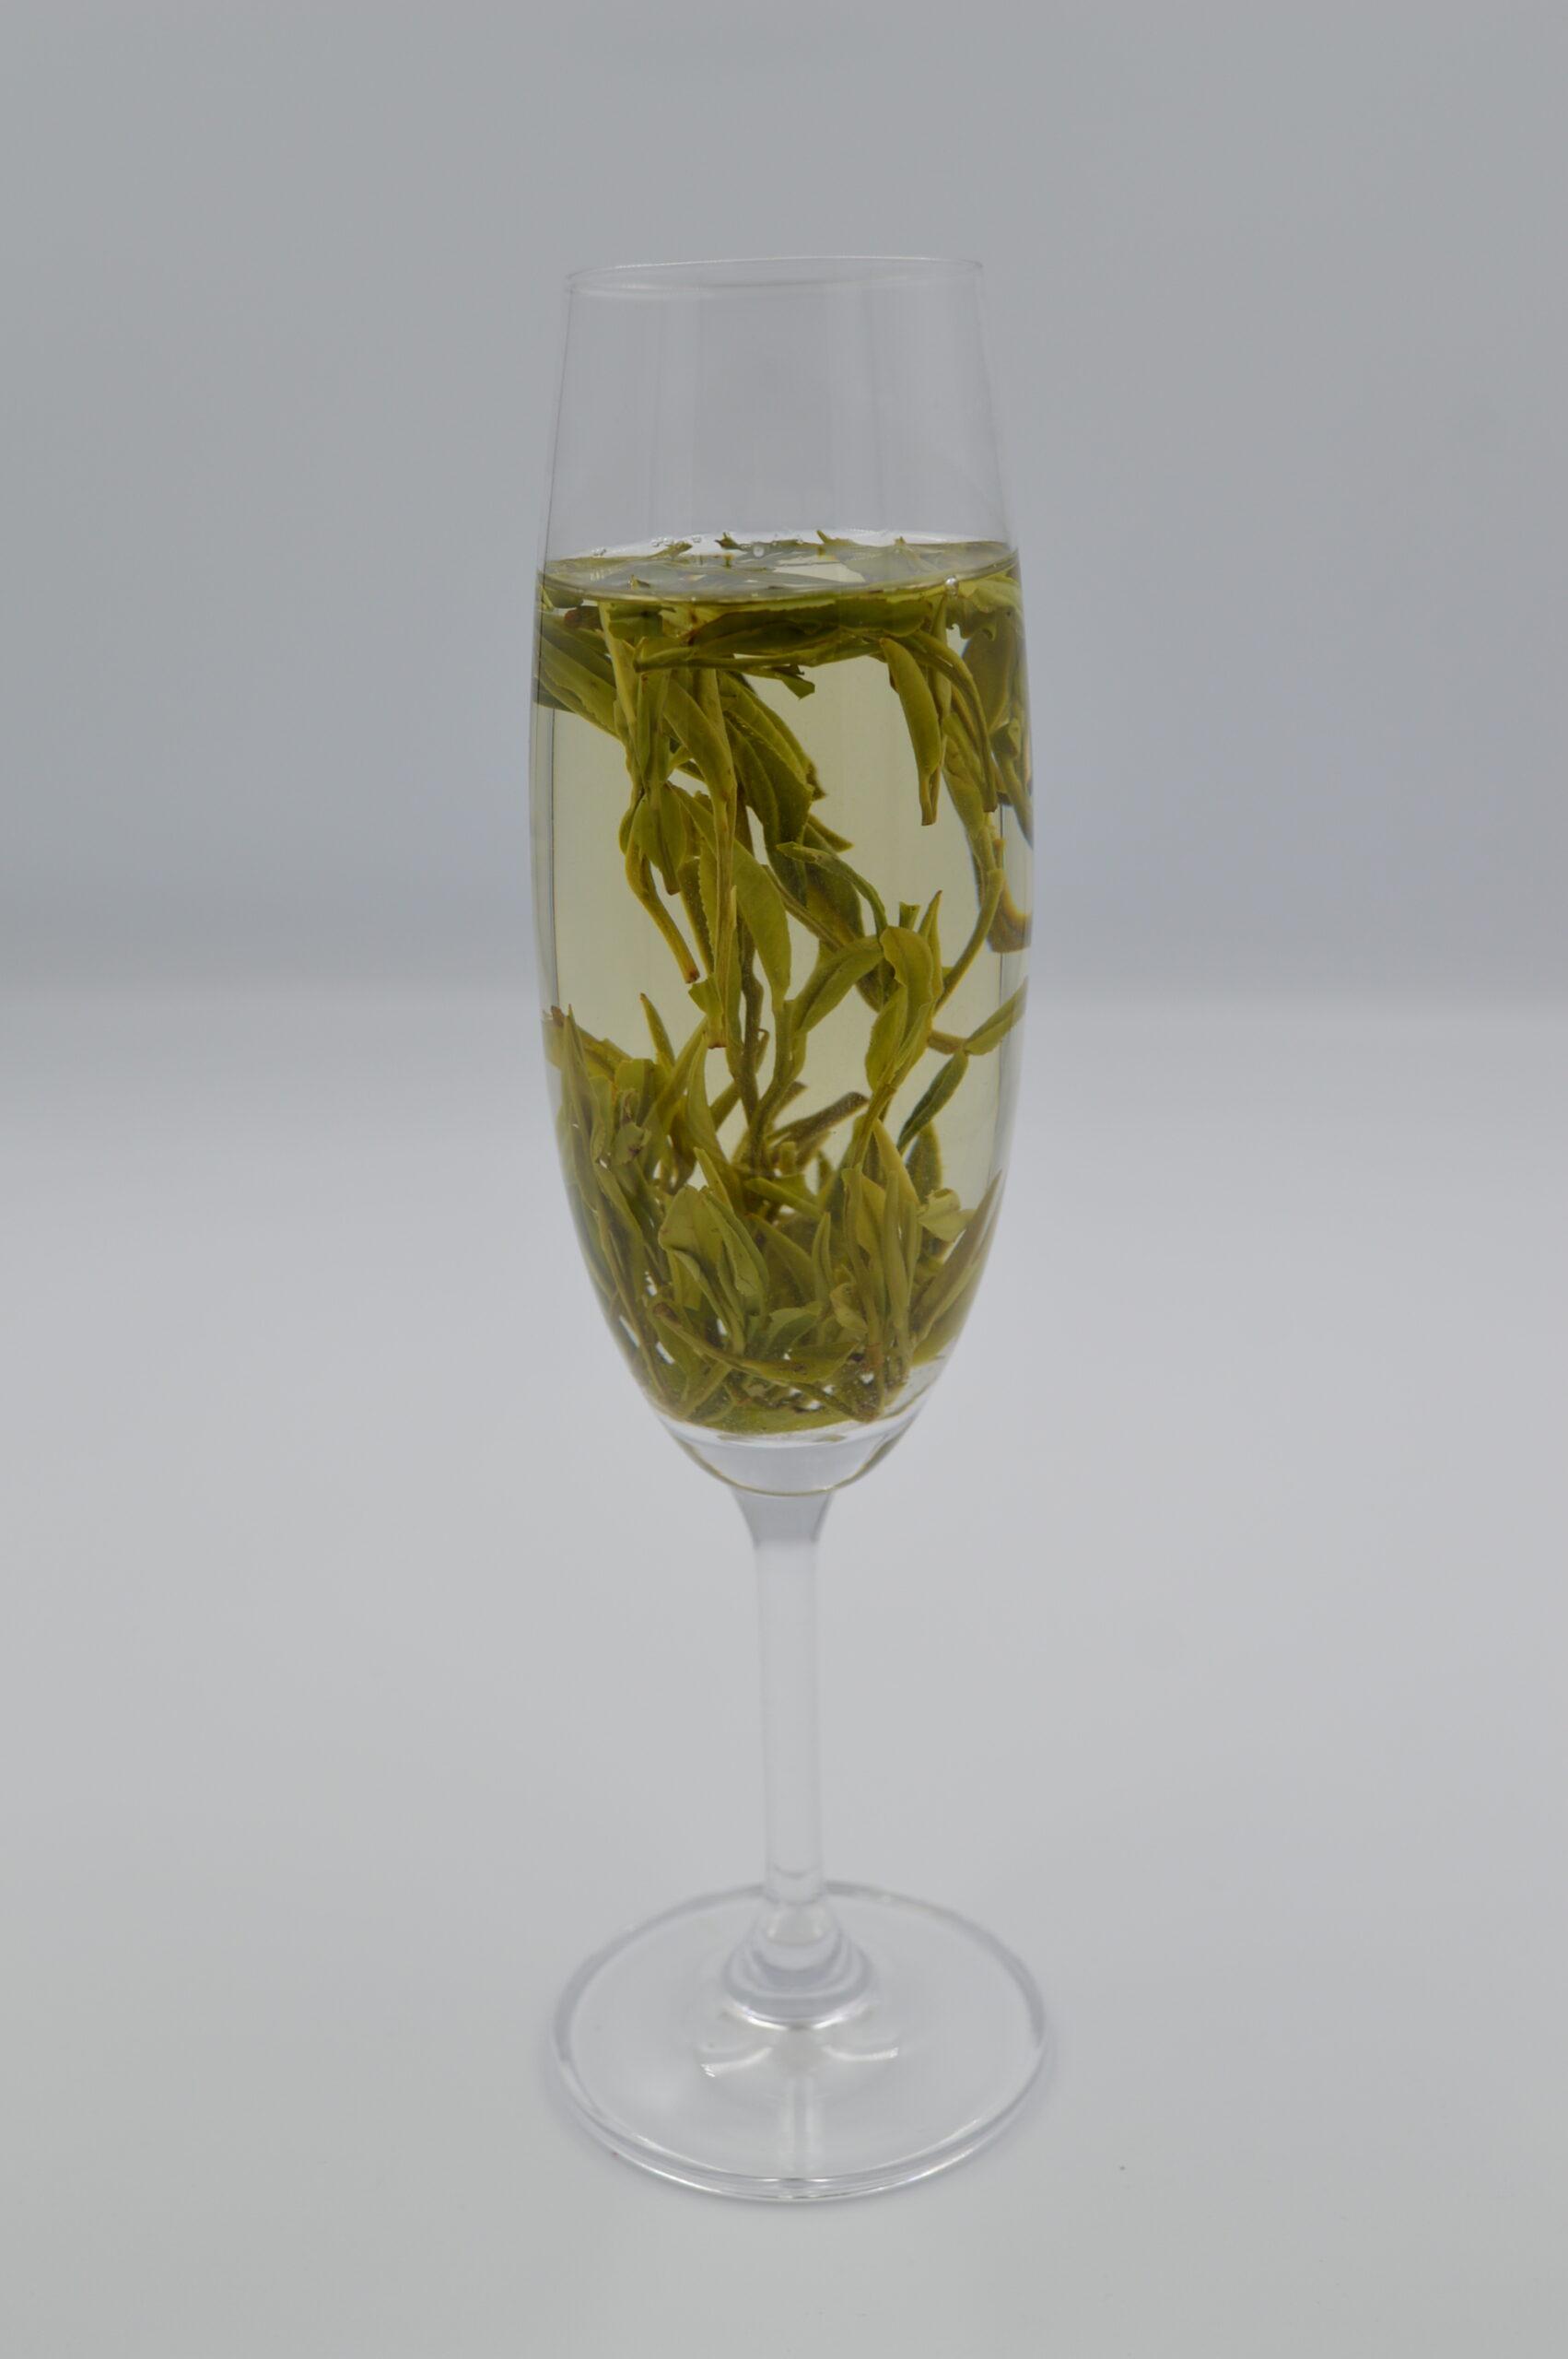 https://shop.liu-tea-art.com/wp-content/uploads/2021/04/DSC_0020-3-scaled.jpg